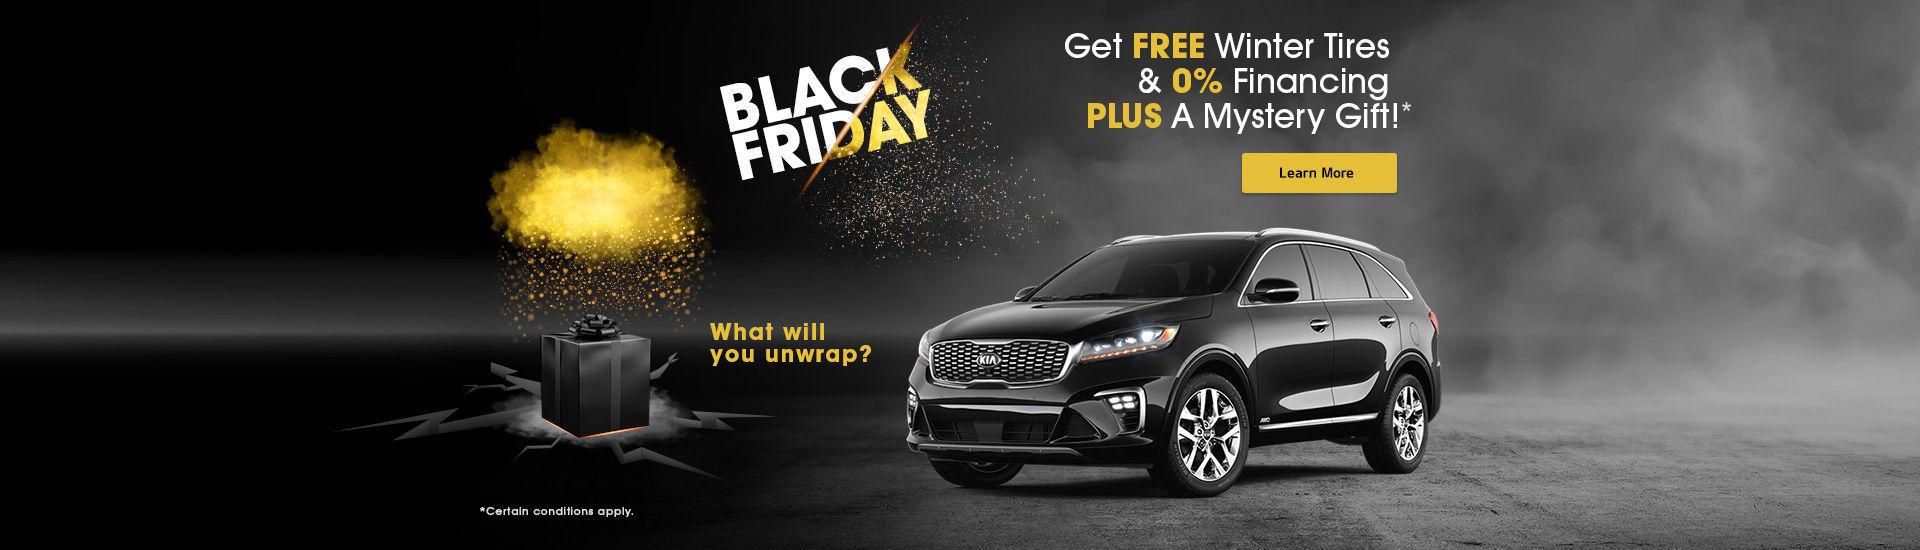 Black Friday at Kitchener Kia!